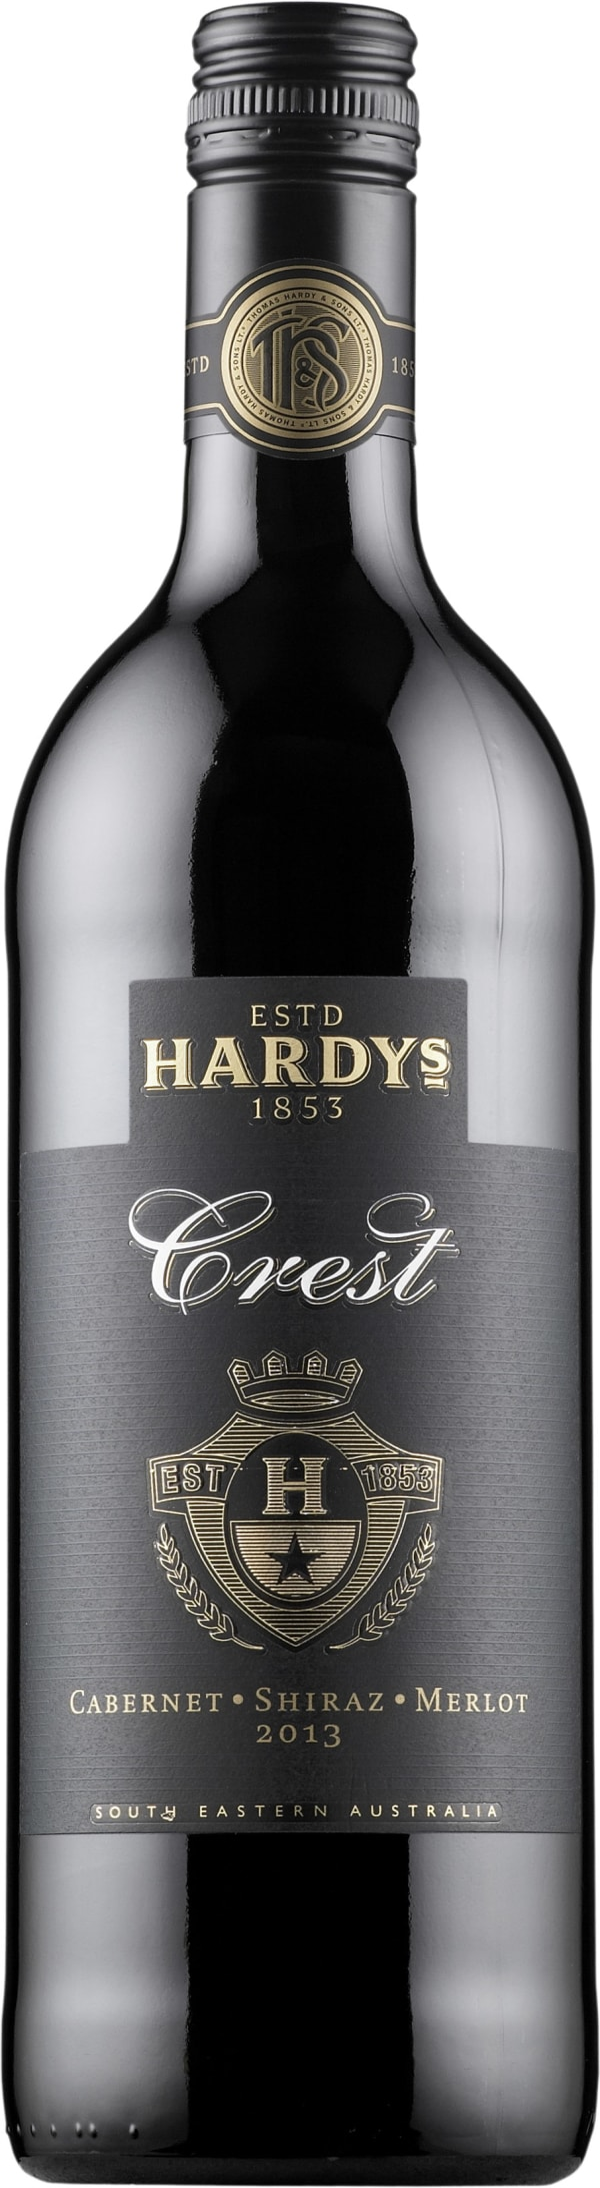 Hardys Crest Cabernet Shiraz Merlot 2016